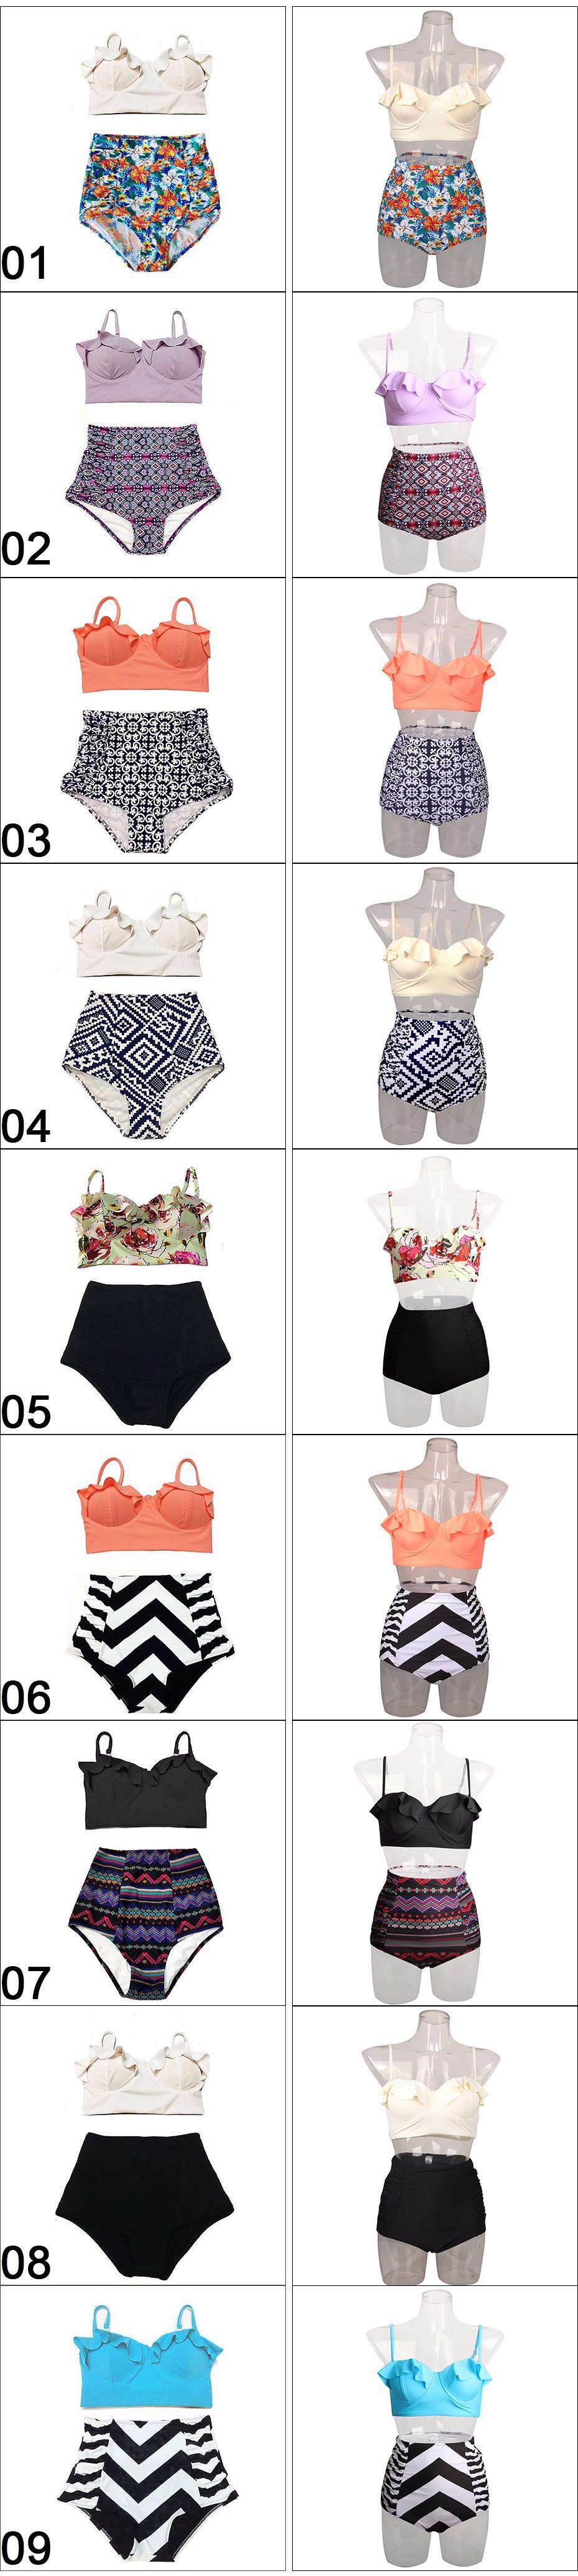 TQSKK 19 New Bikinis Women Swimsuit High Waist Bathing Suit Plus Size Swimwear Push Up Bikini Set Vintage Retro Beach Wear XXL 4